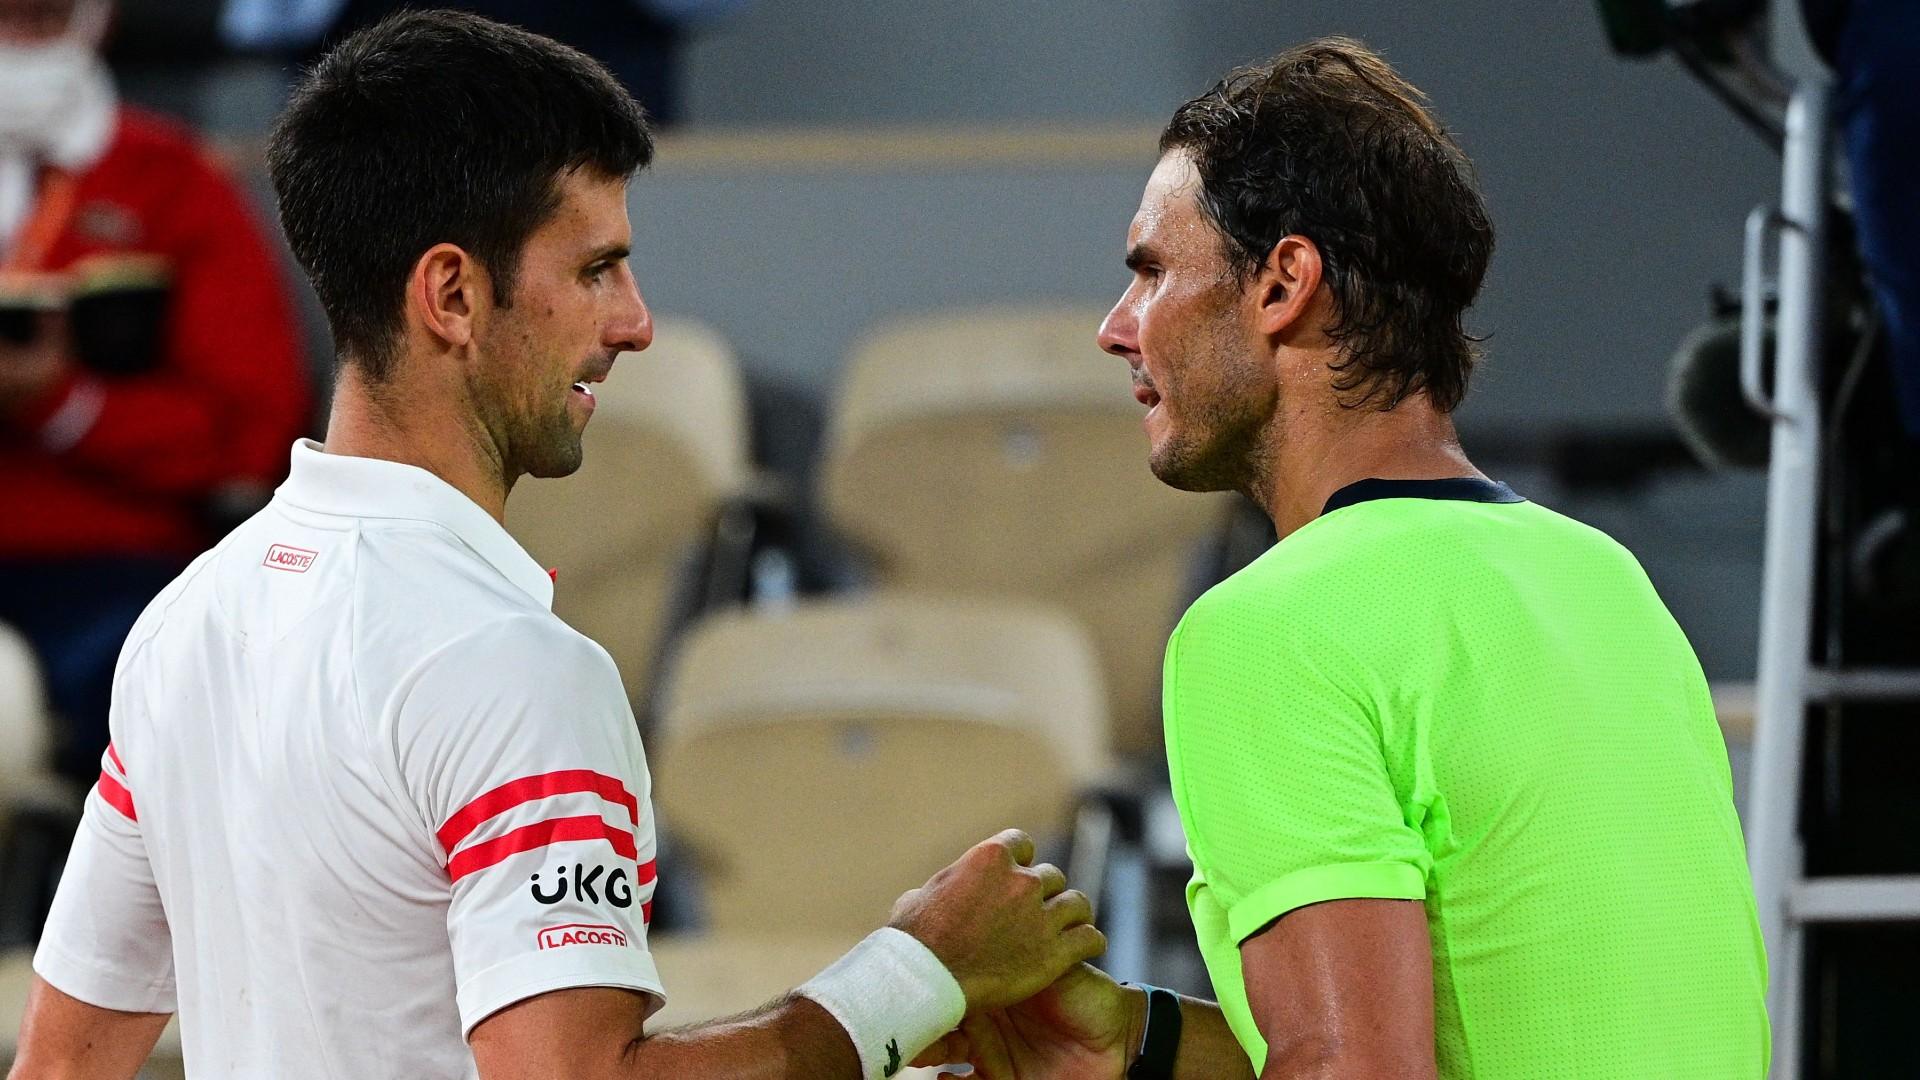 French Open 2021: Twitter reacts to Novak Djokovic-Rafael Nadal's semifinal thriller